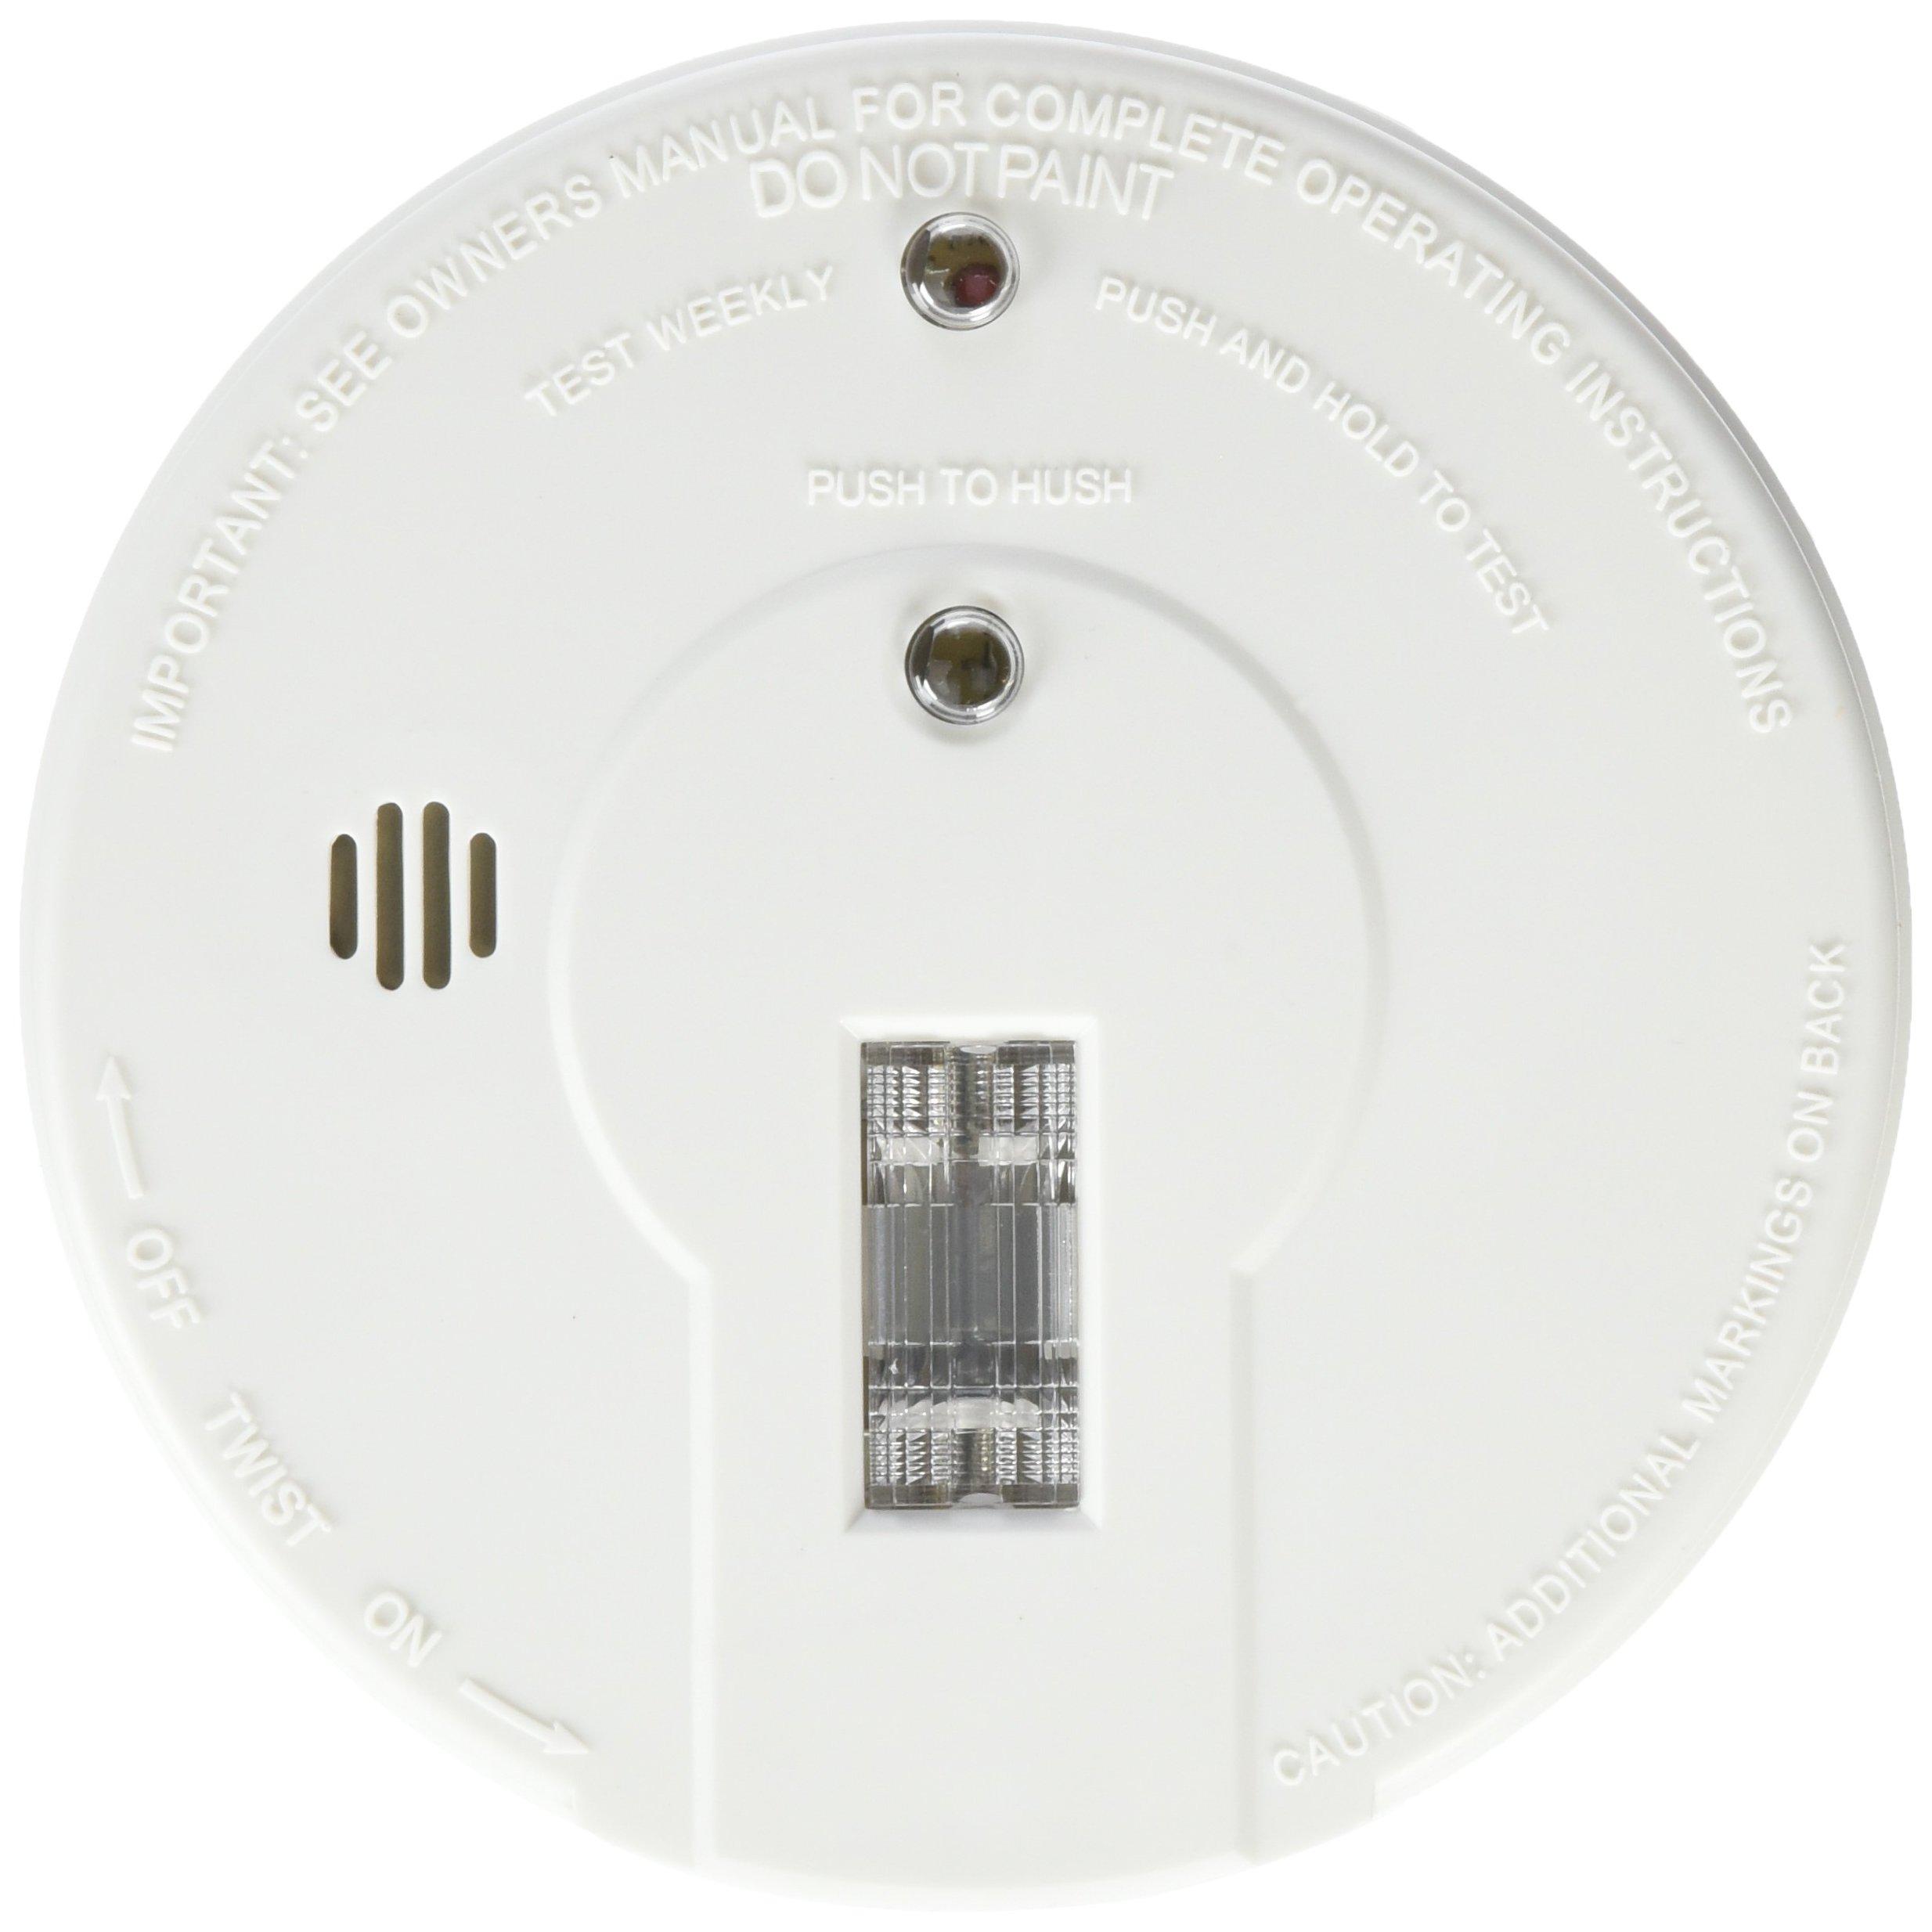 Kidde 408-I9080 i9080 Battery Powered Smoke Alarm with Safety Light